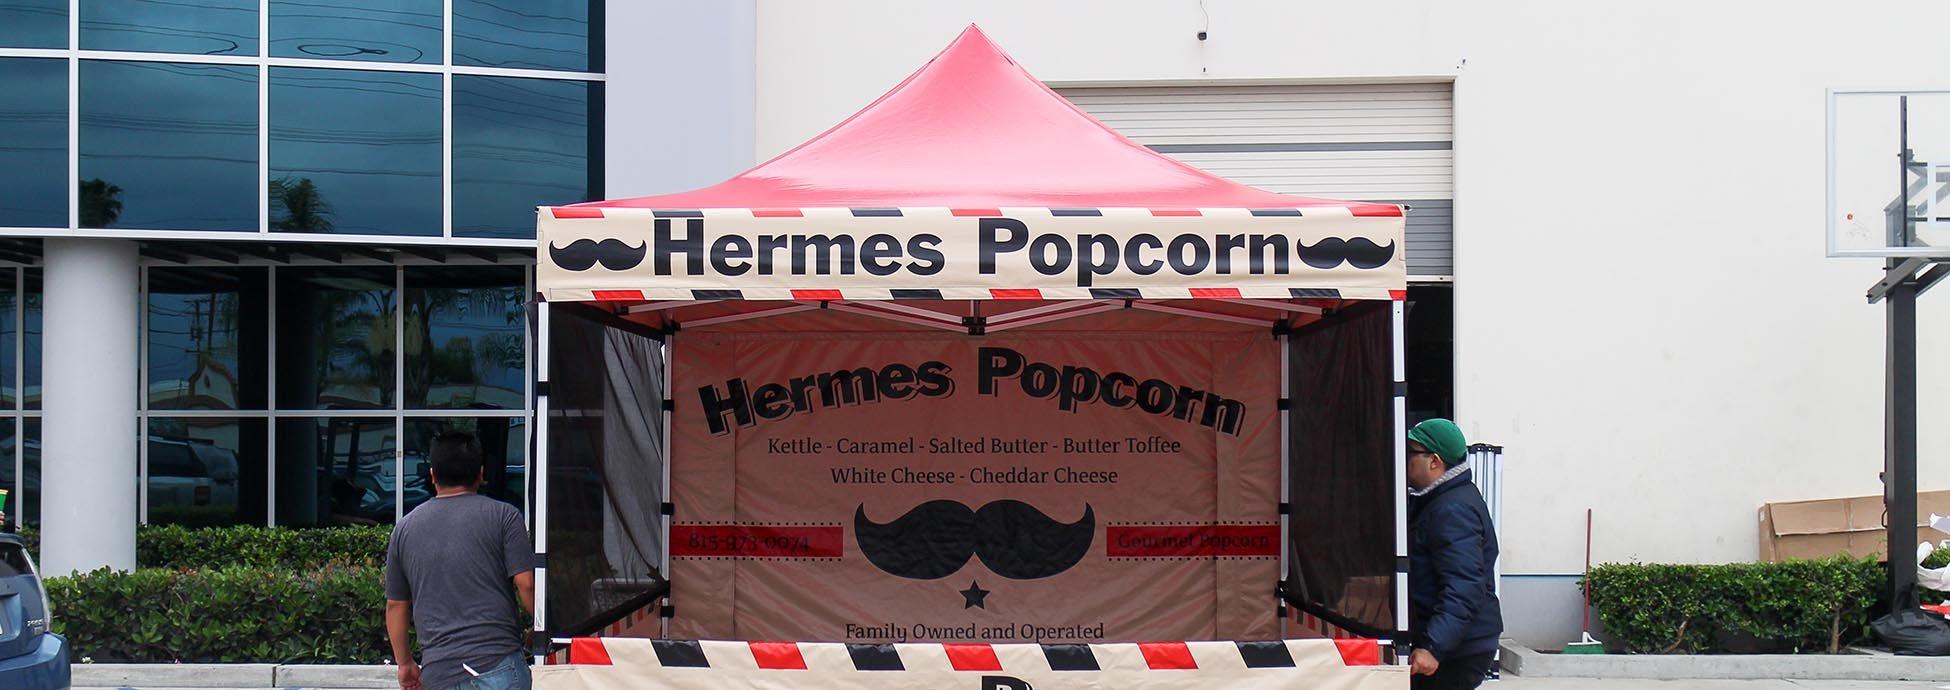 hermes-popcorn-header.jpg